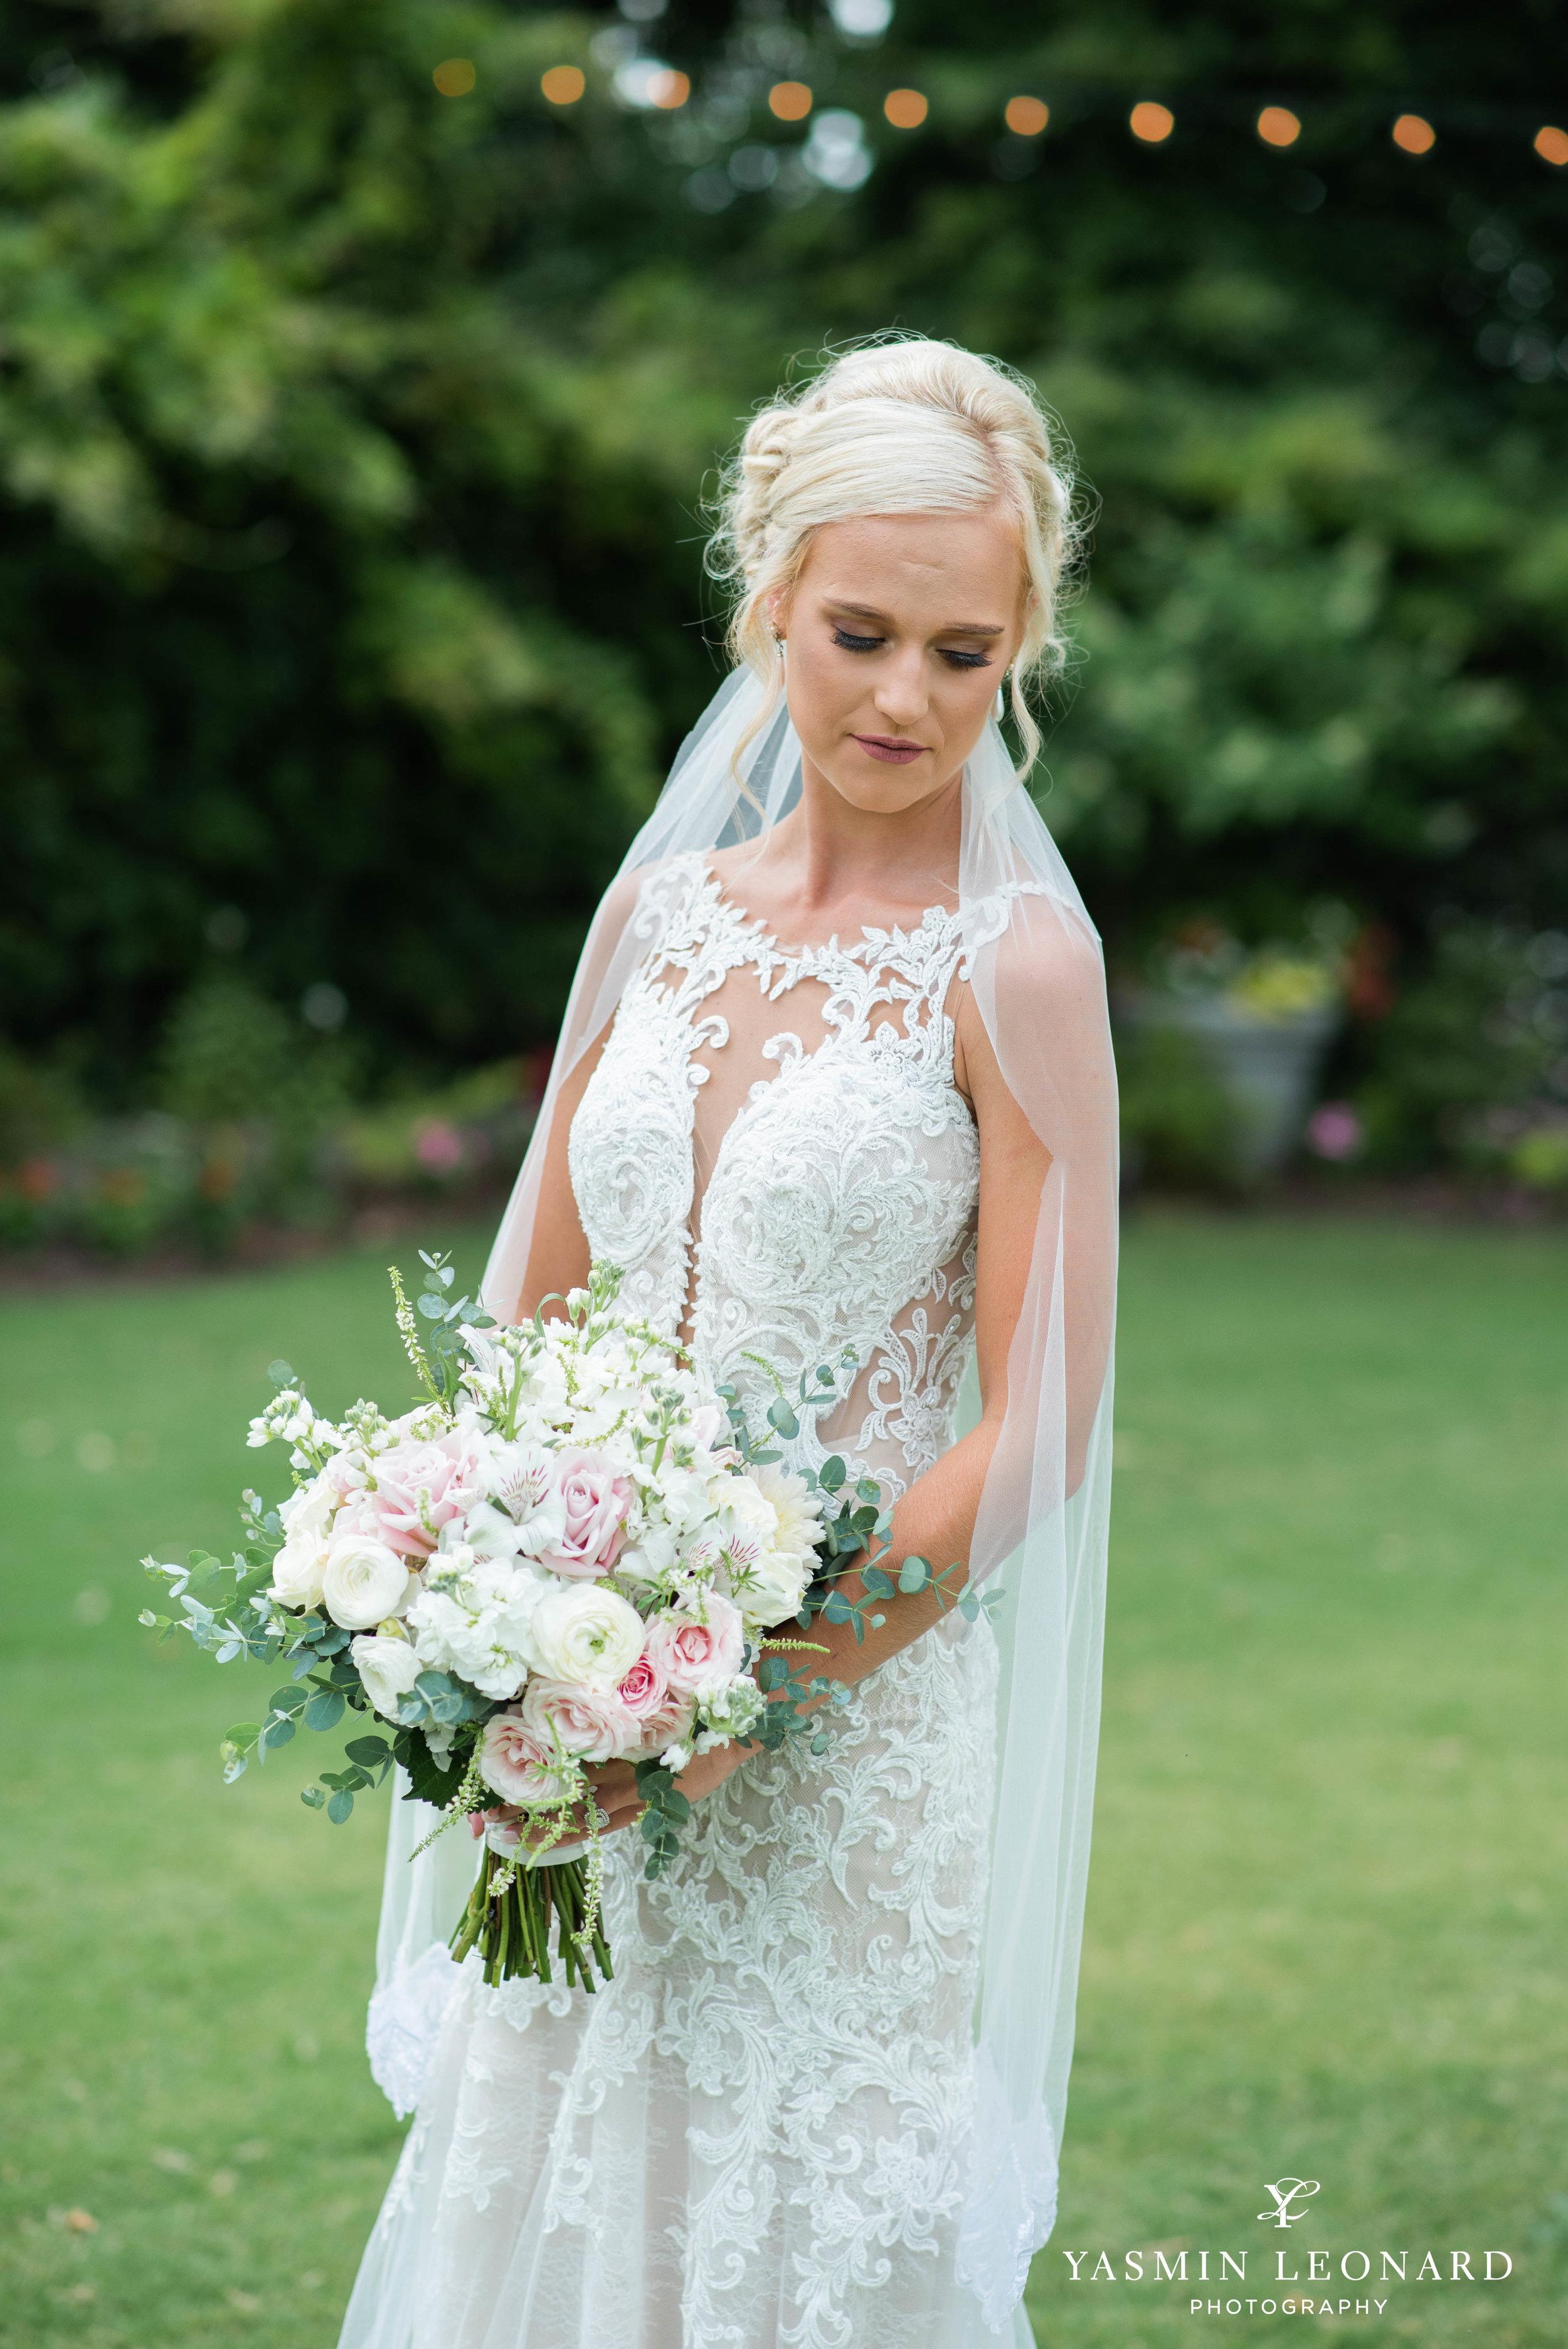 Separk Mansion - NC Weddings - Gastonia Wedding - NC Wedding Venues - Pink and Blue Wedding Ideas - Pink Bridesmaid Dresses - Yasmin Leonard Photography-12.jpg